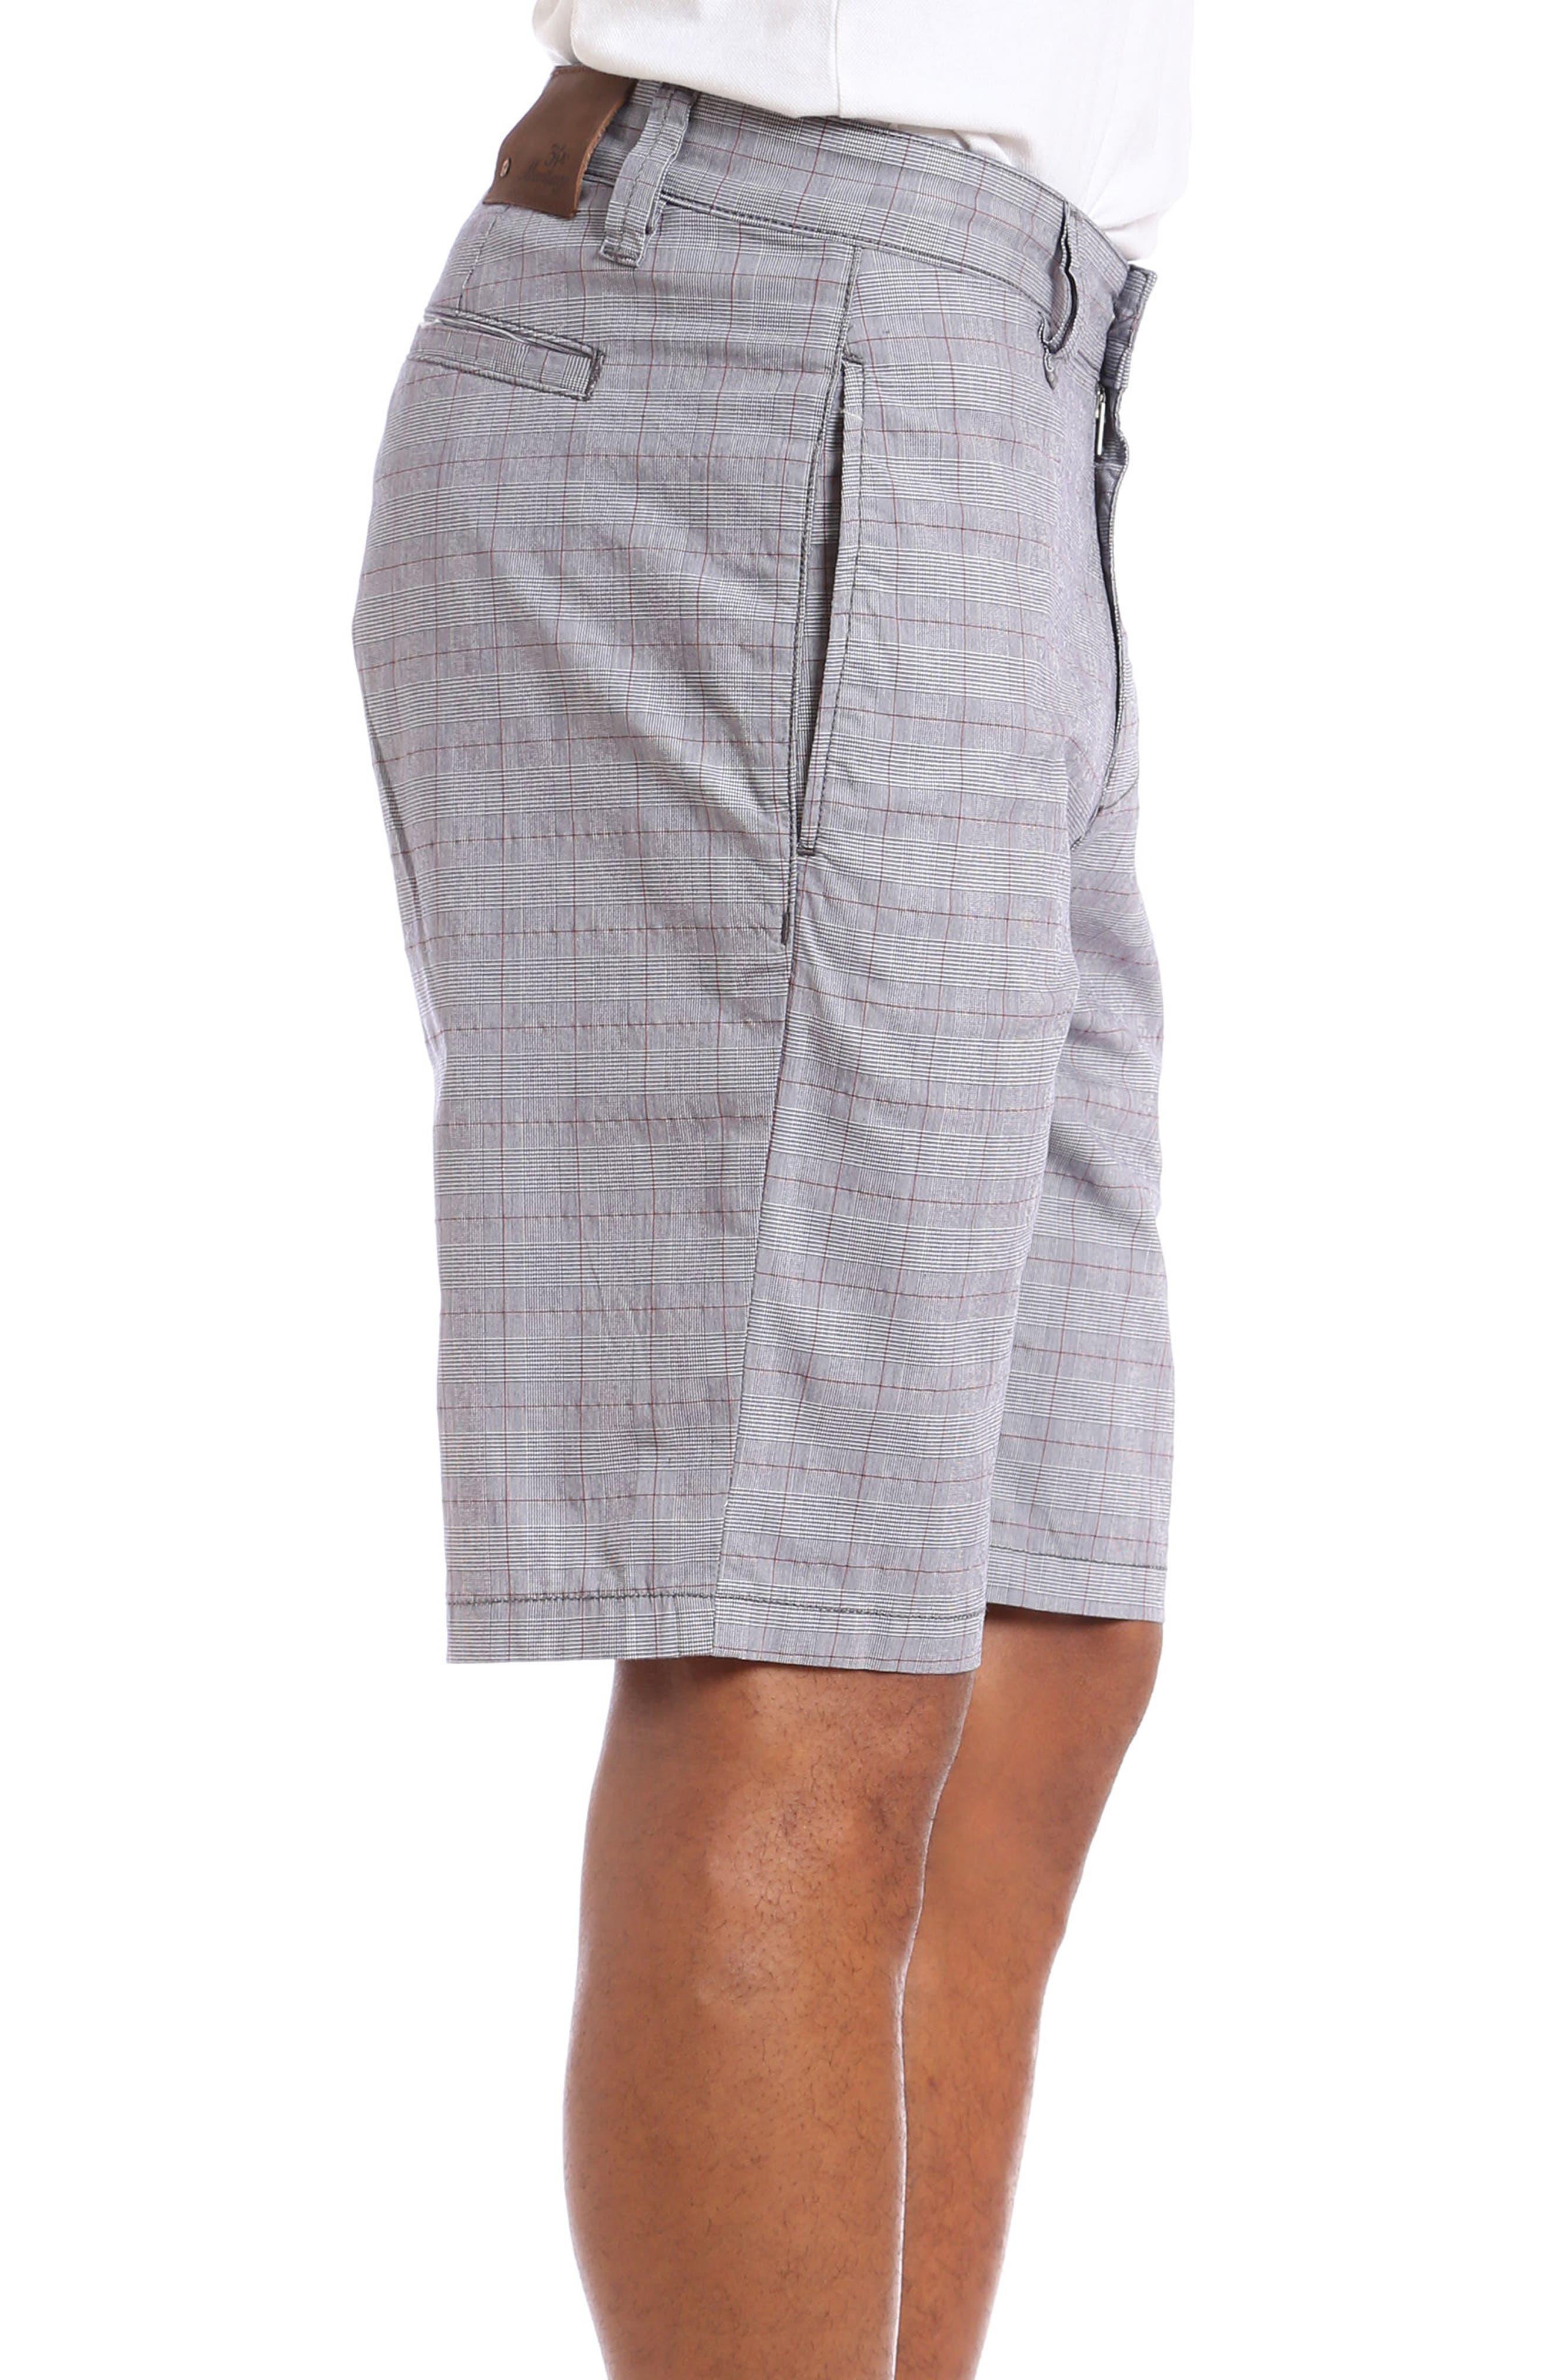 Nevada Twill Shorts,                             Alternate thumbnail 3, color,                             GREY PLAID